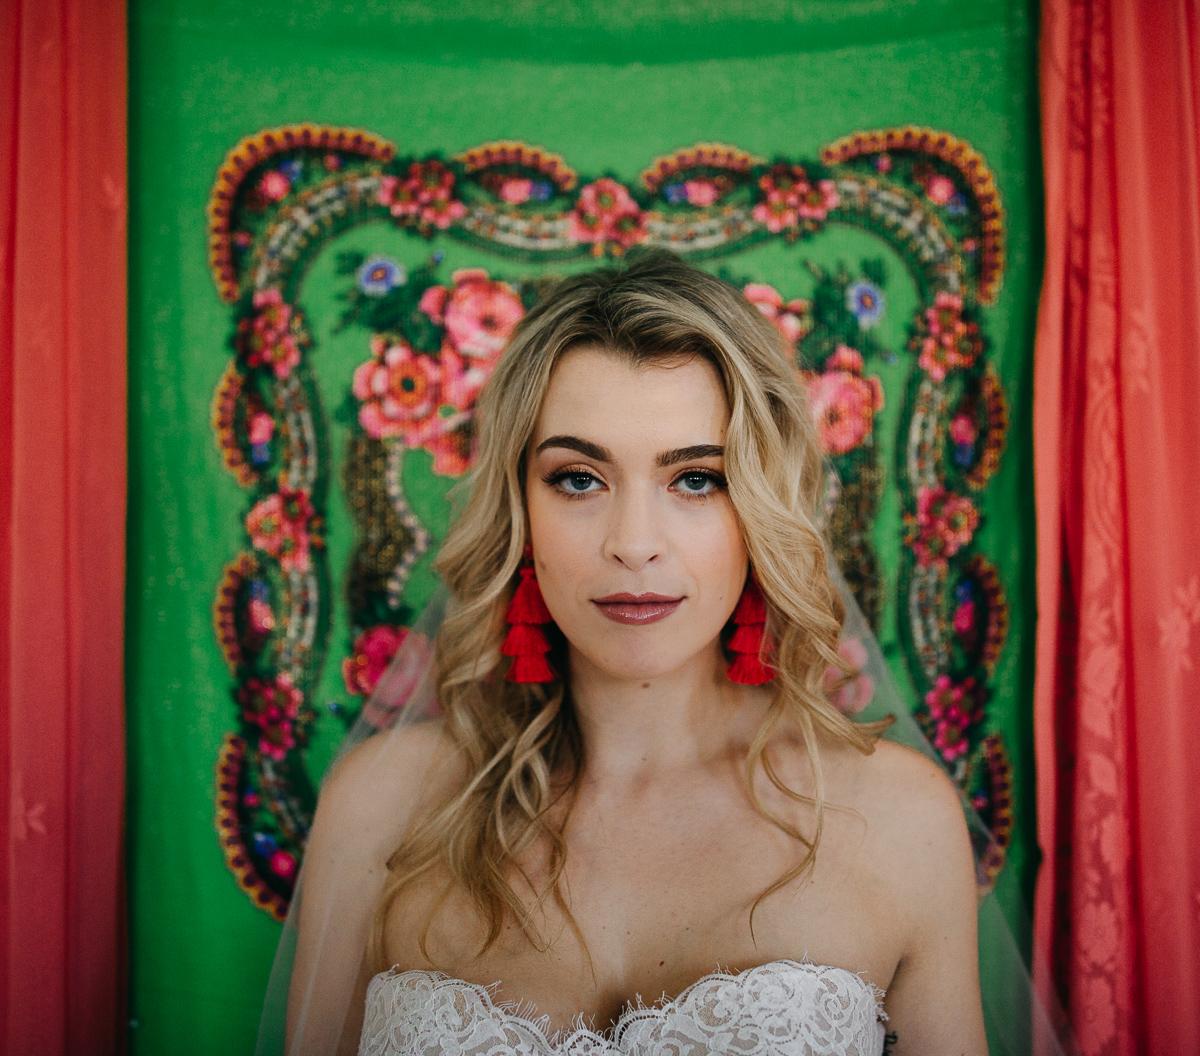 Beautiful bride with a fun backdrop!